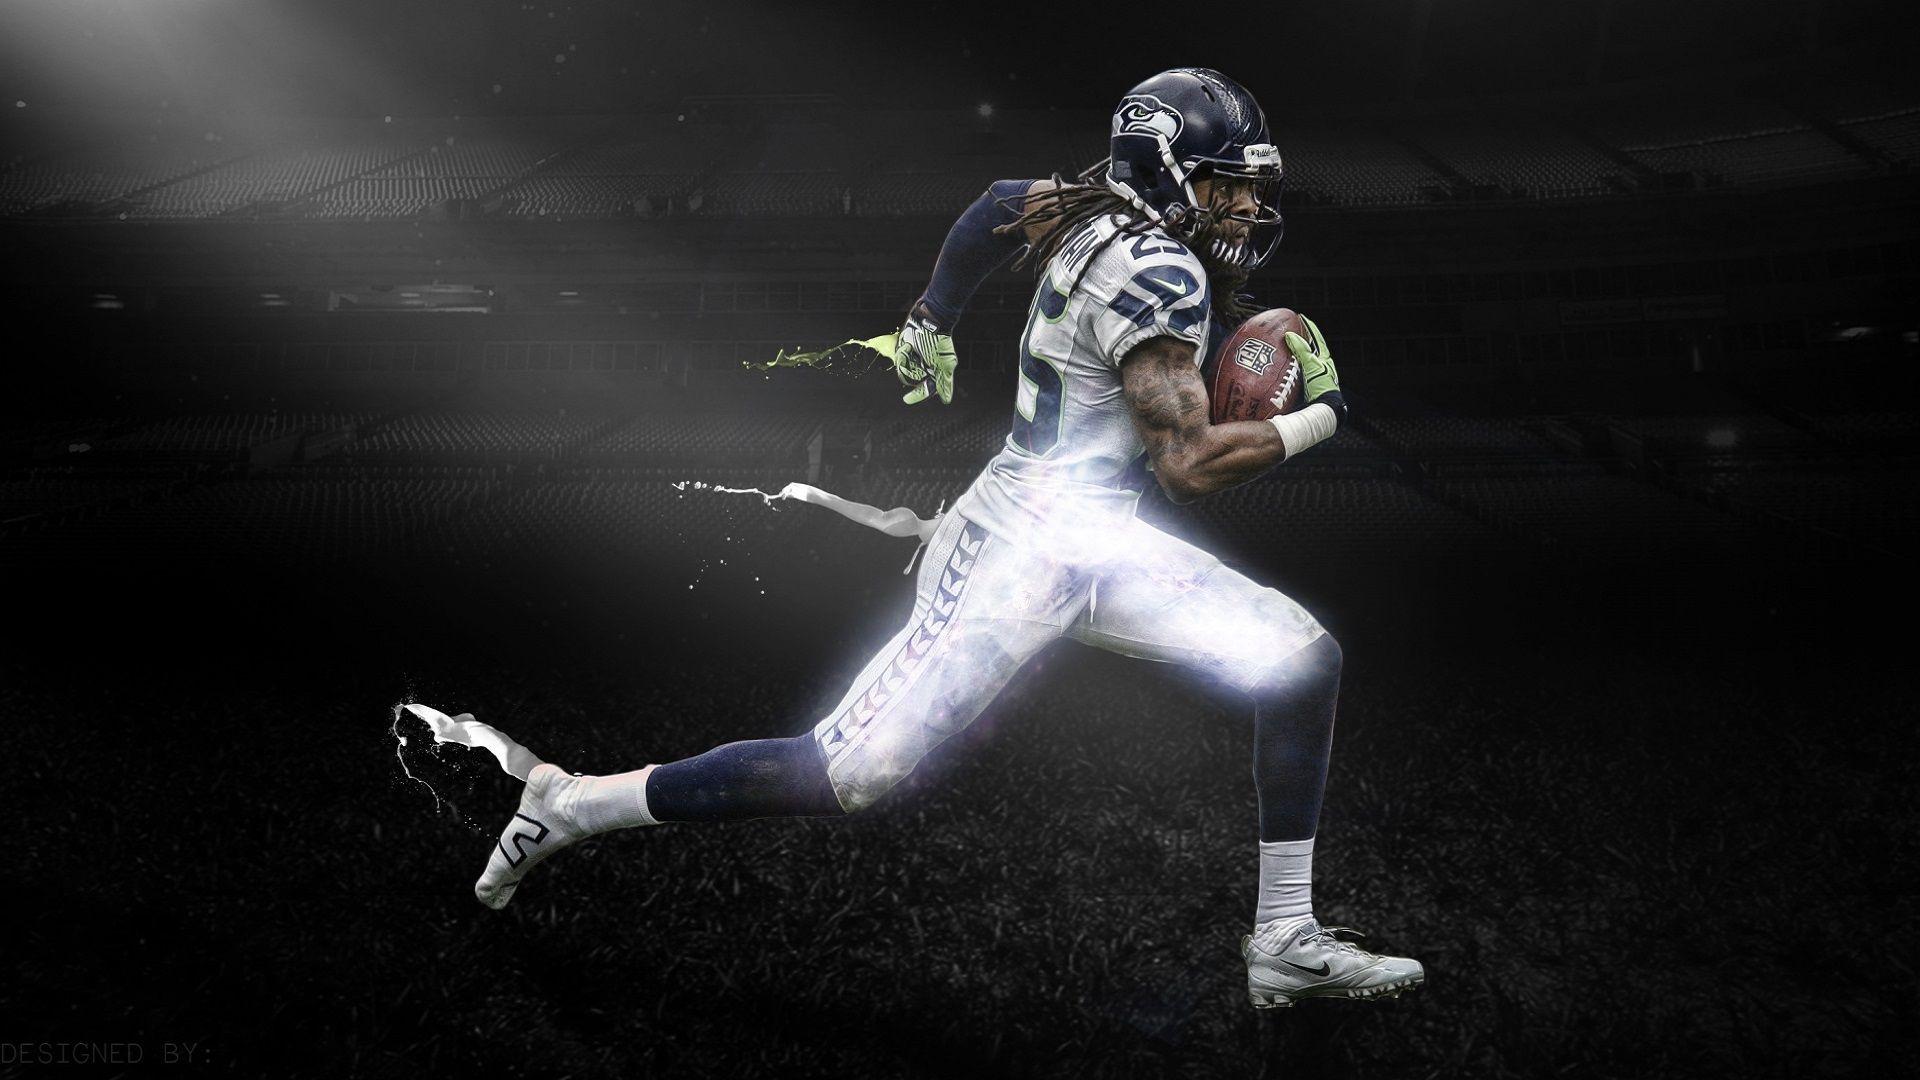 Richard Sherman Wallpaper Free Backgrounds Desktop Widescreen Sports Wallpapers